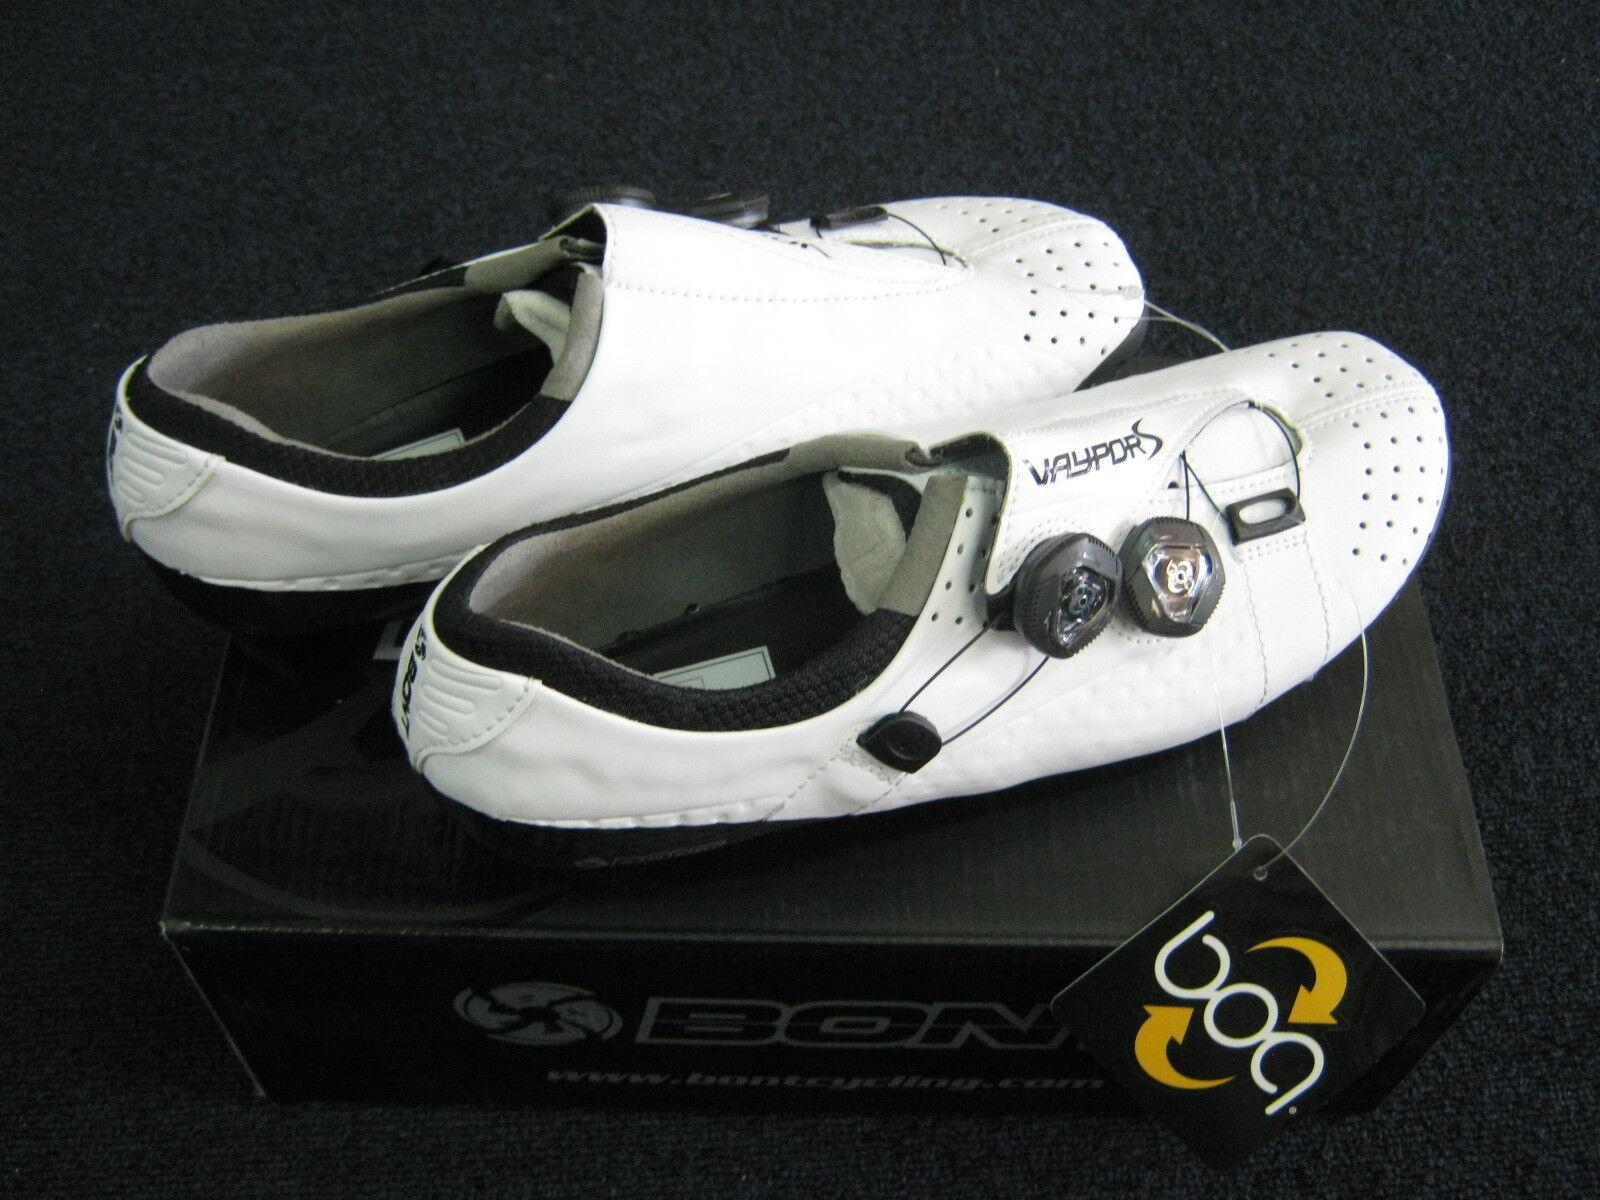 Bont Vaypor S carbon racing shoes  White Asian fit  guaranteed